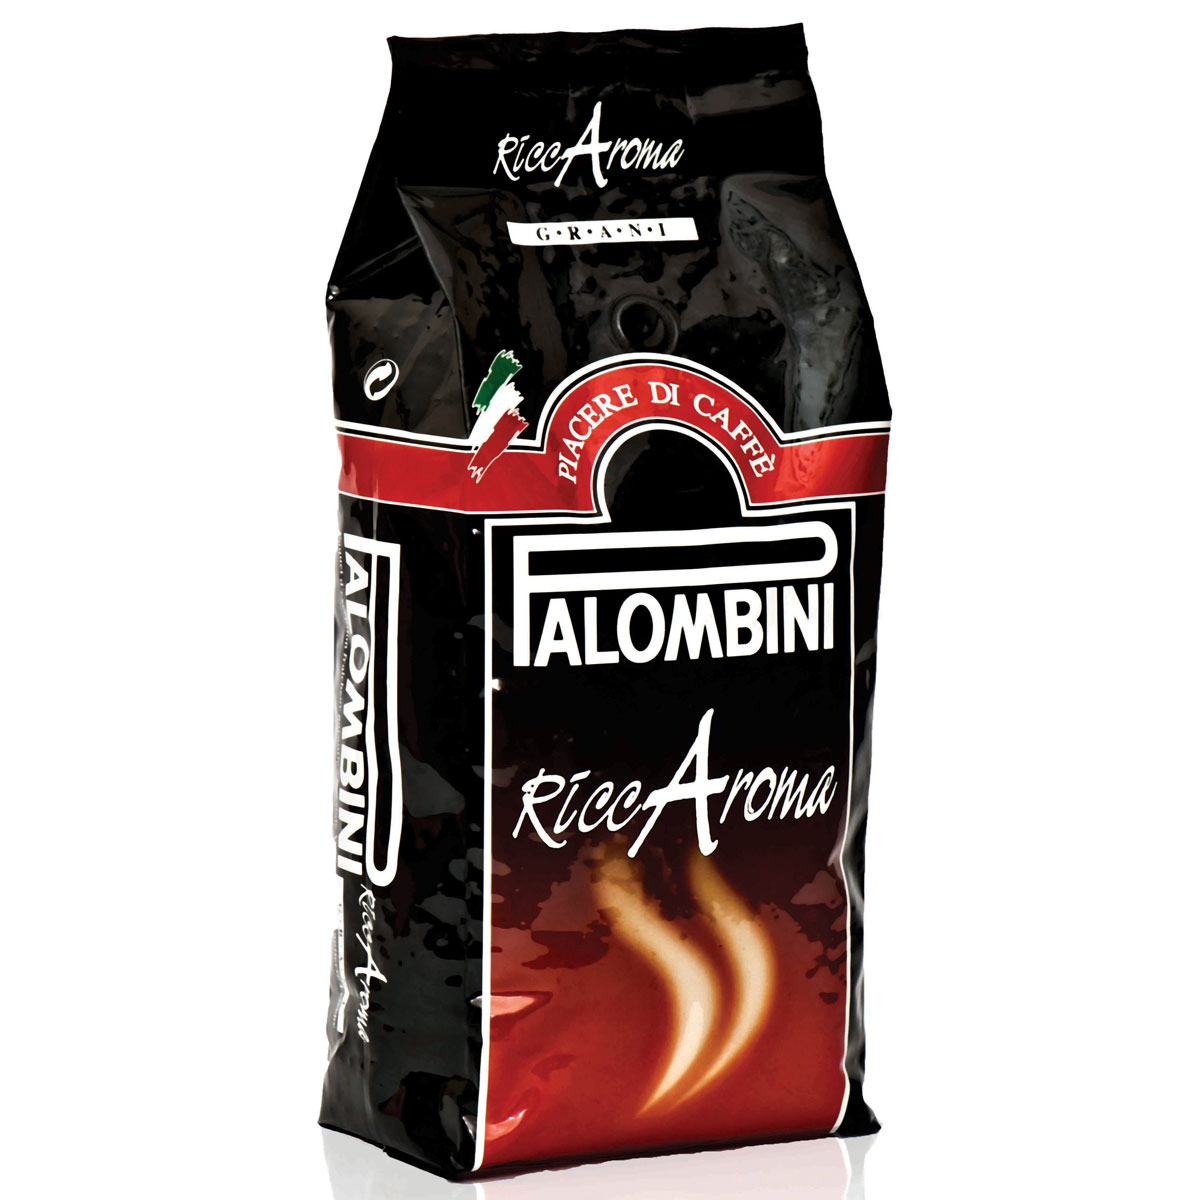 Palombini Riccaroma кофе в зернах, 1 кг palombini pal oro